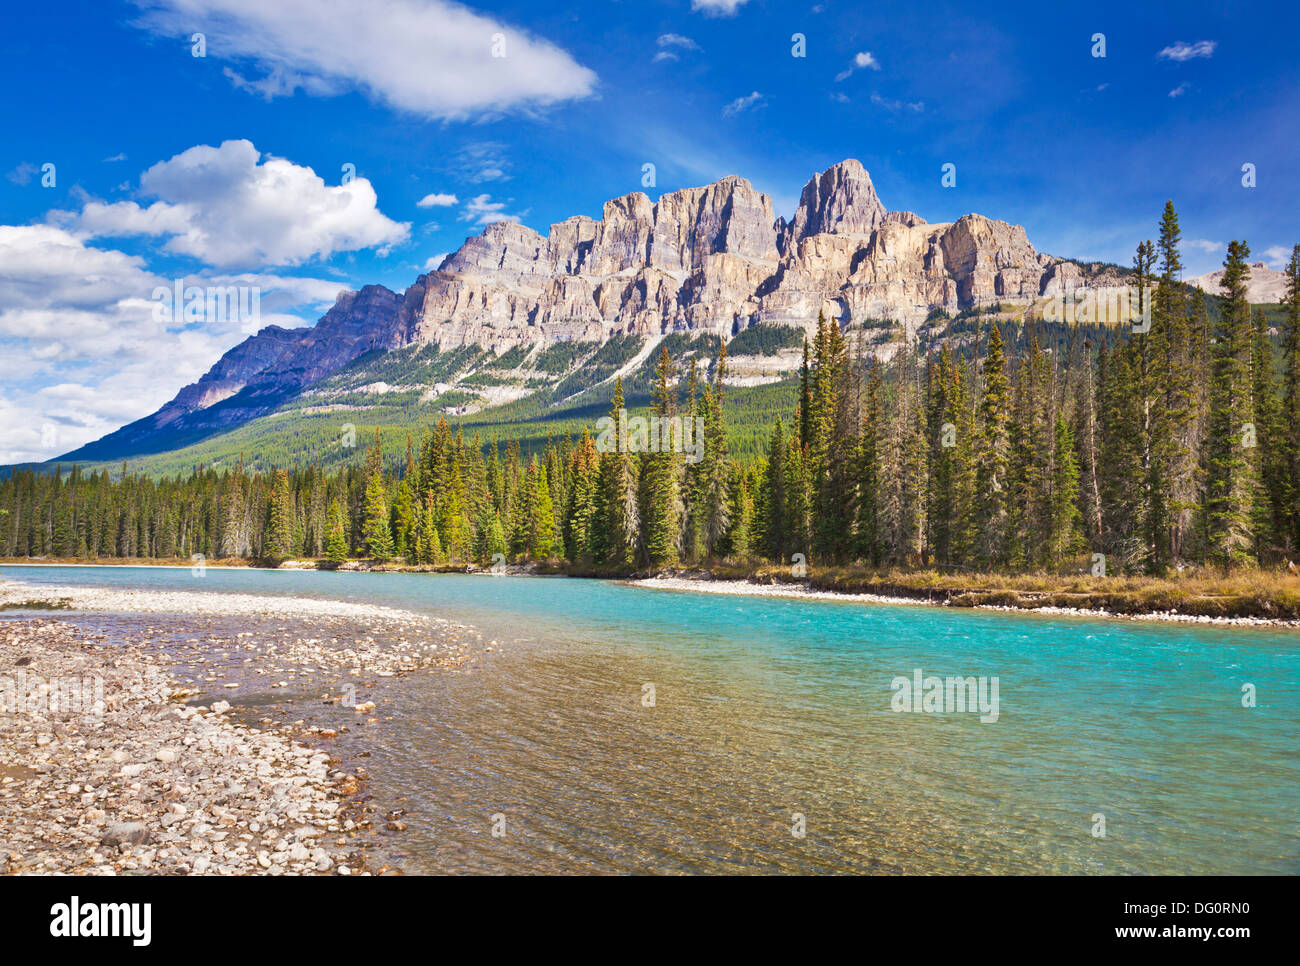 Schloss Berg hinter dem Bow River am Schloss Junction Bow Valley Parkway Banff National park canadian Rockies Alberta Kanada Stockbild